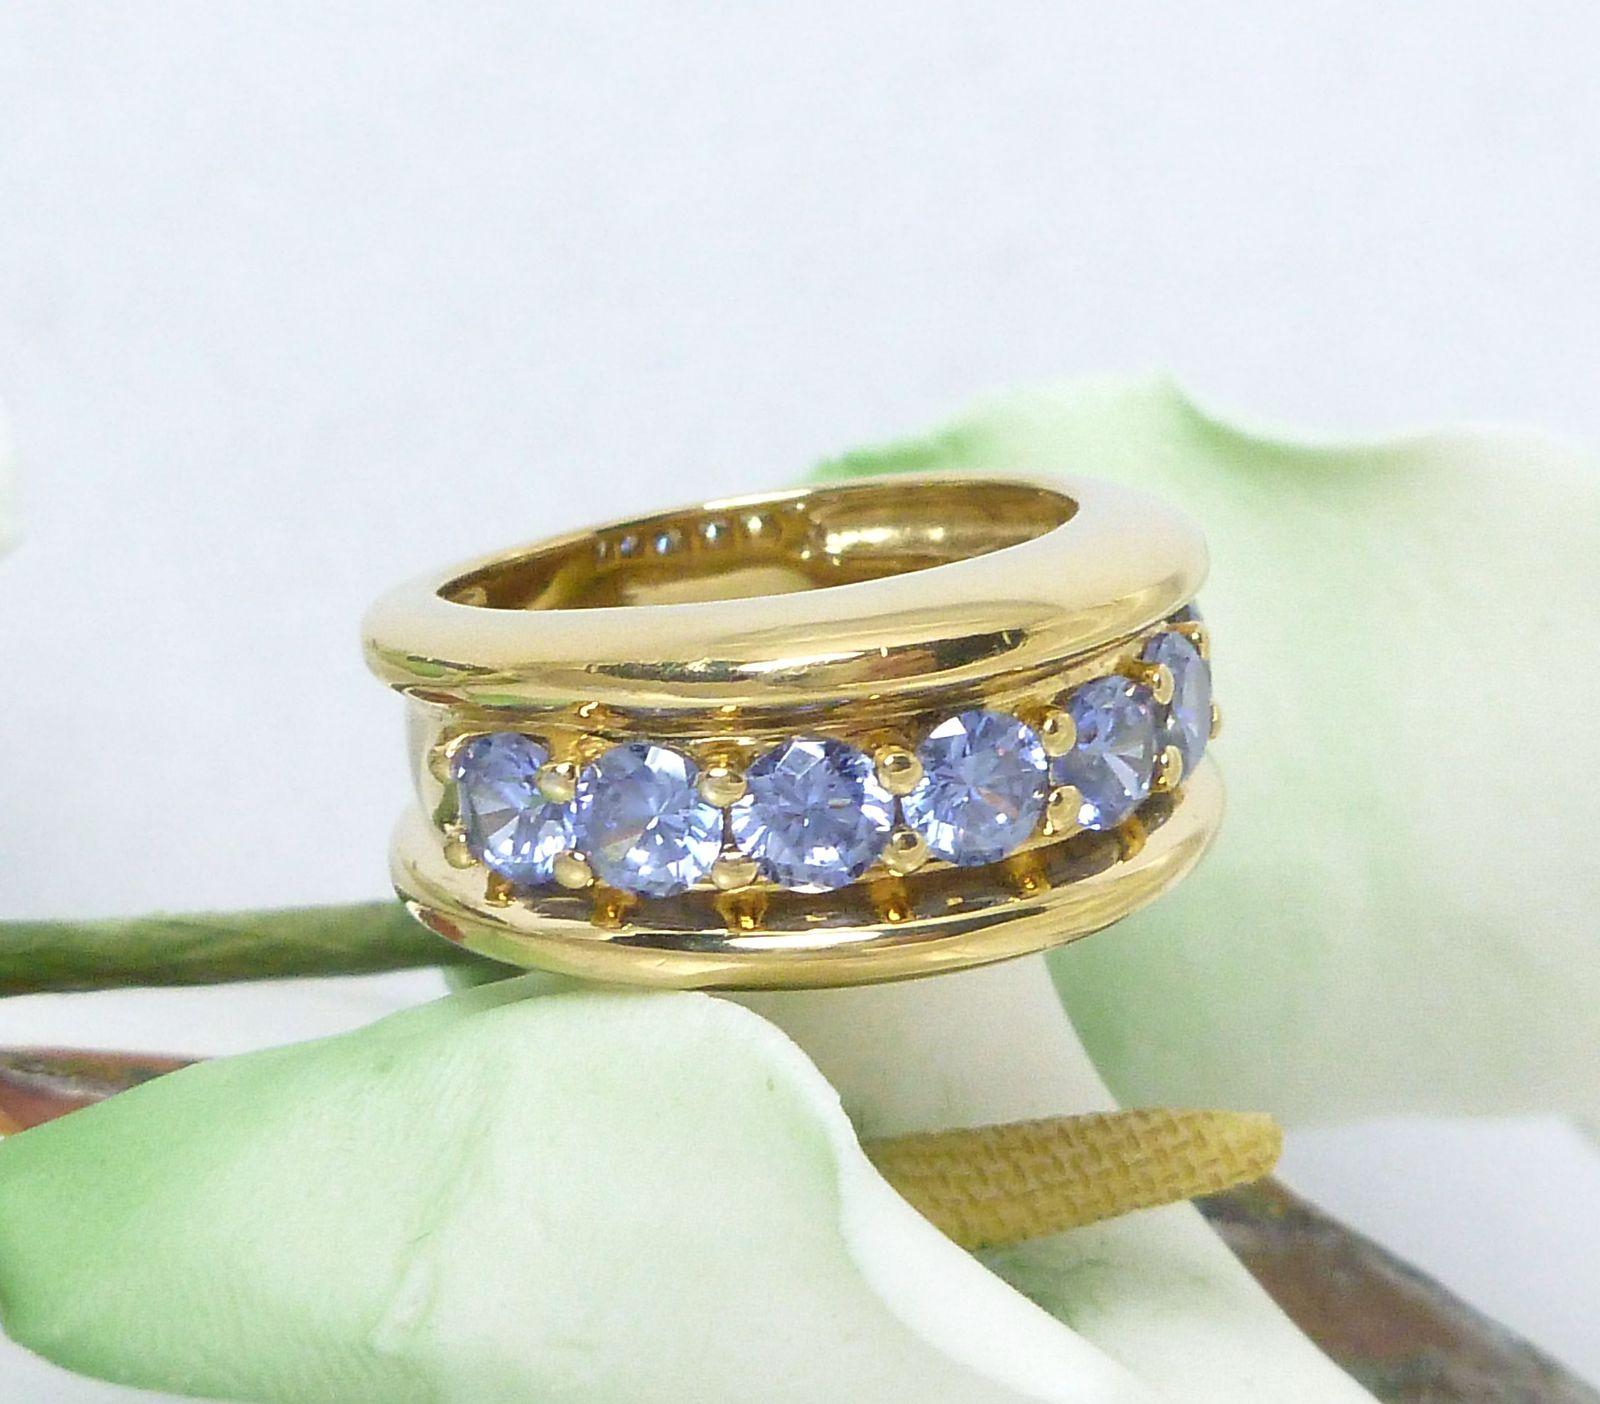 Technibond Tanzanite CZ Ring 18K Yellow Gold over Sterling Size 7